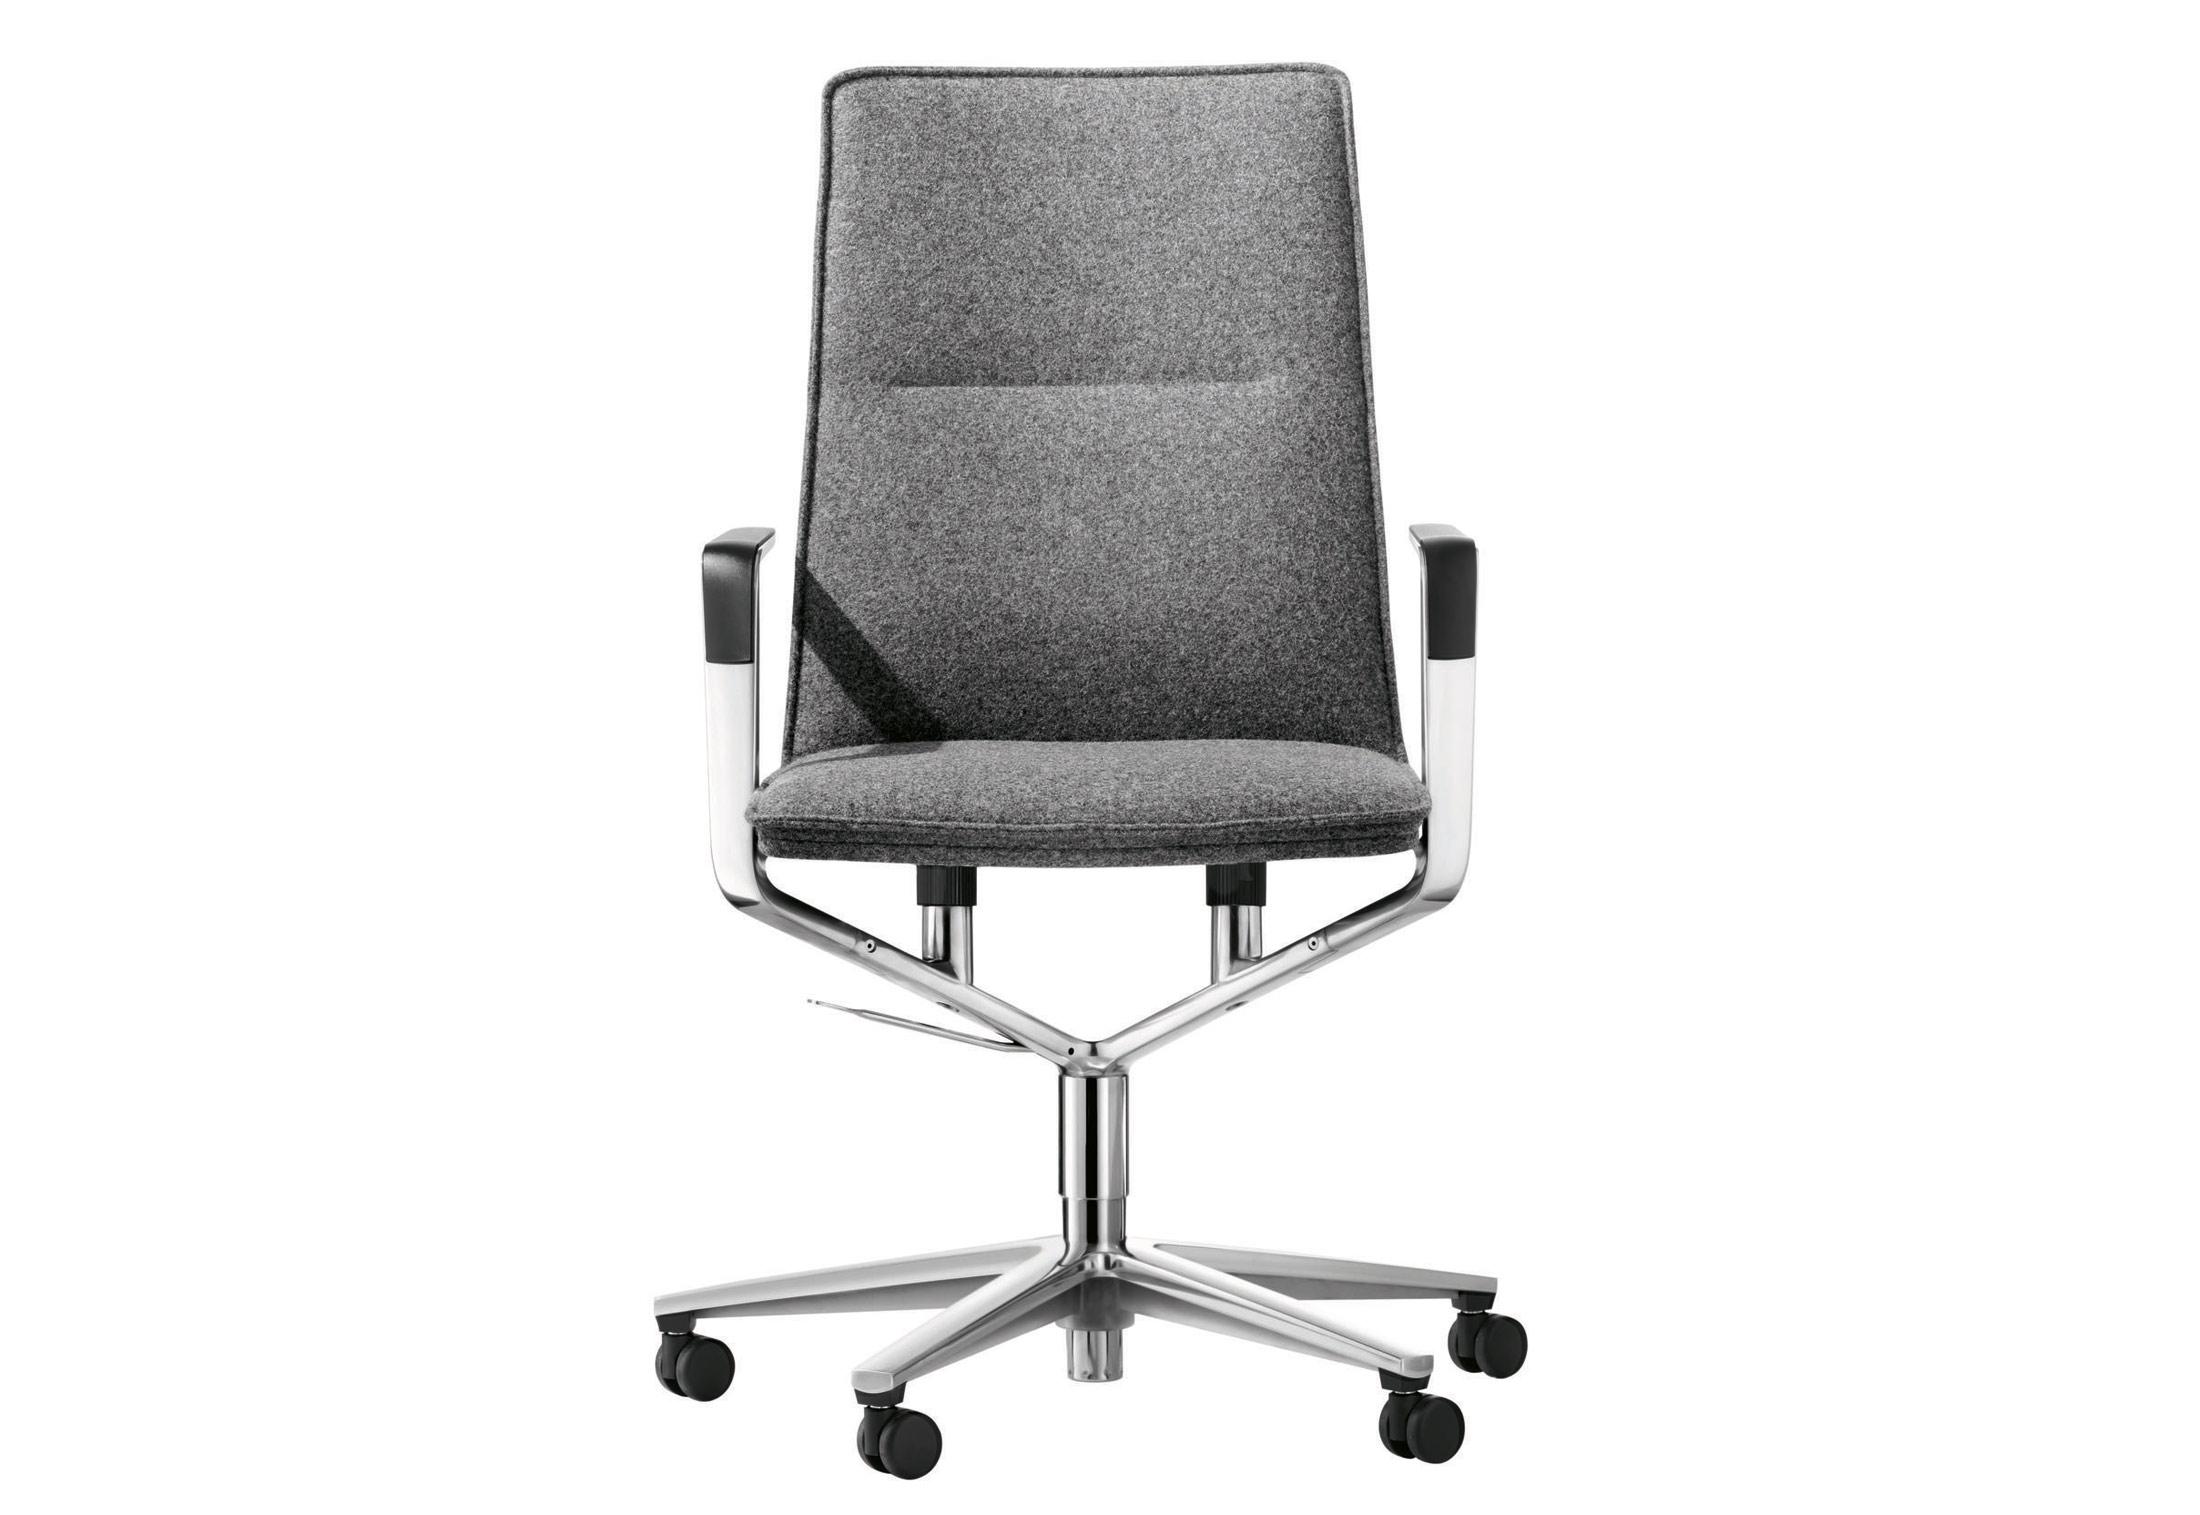 Sola Swivel Chair by Wilkhahn